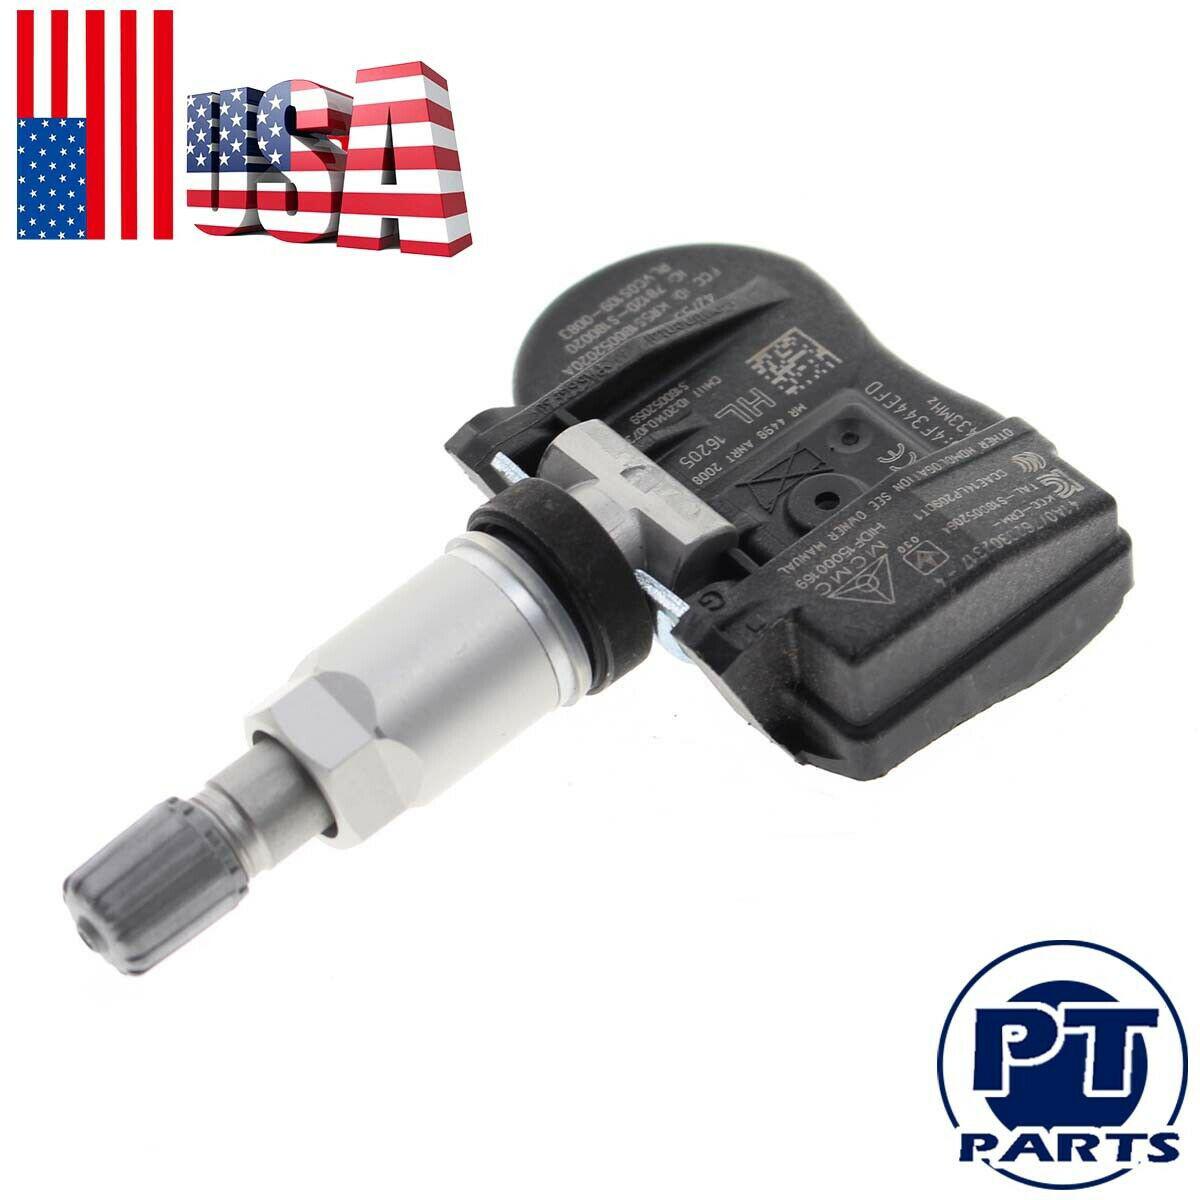 TPMS Tire Pressure Monitor Sensor 42753-T6N-A01 4PCS For 2017 2018 2019 Honda Ridgeline 2018 2019 Honda Odyssey 2018 2019 Honda Pilot 42753T6NA01